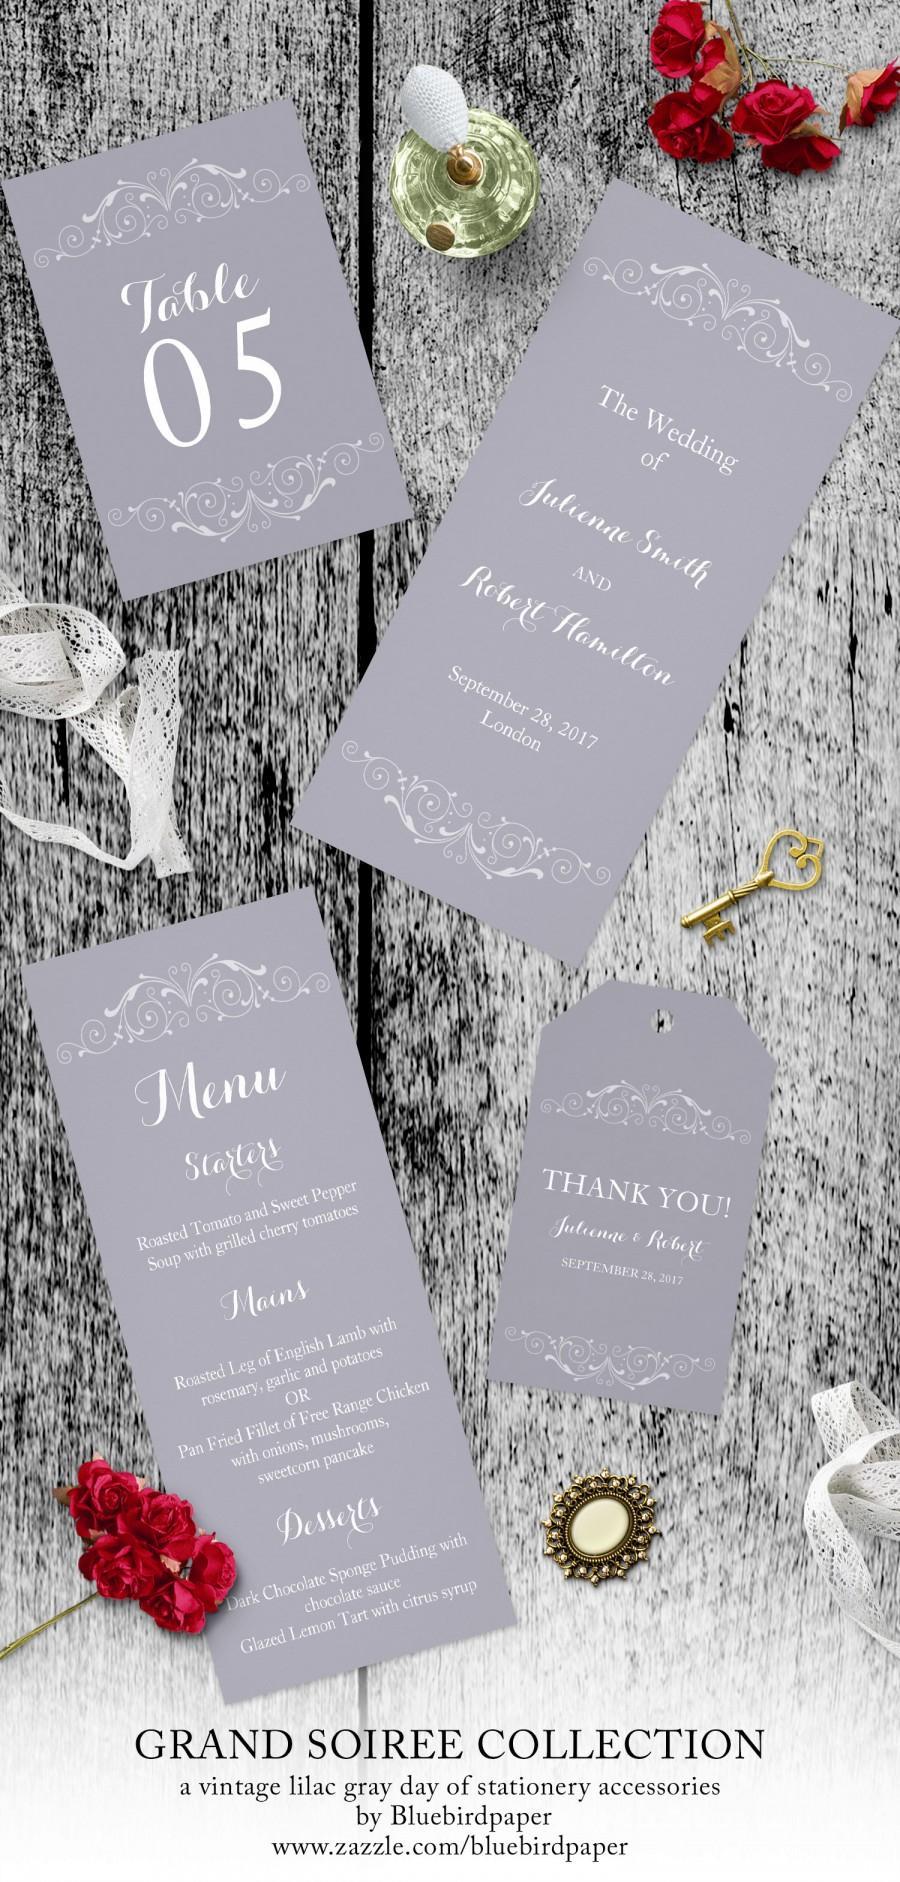 زفاف - Grand Soiree, a vintage lilac gray day of stationery accessories